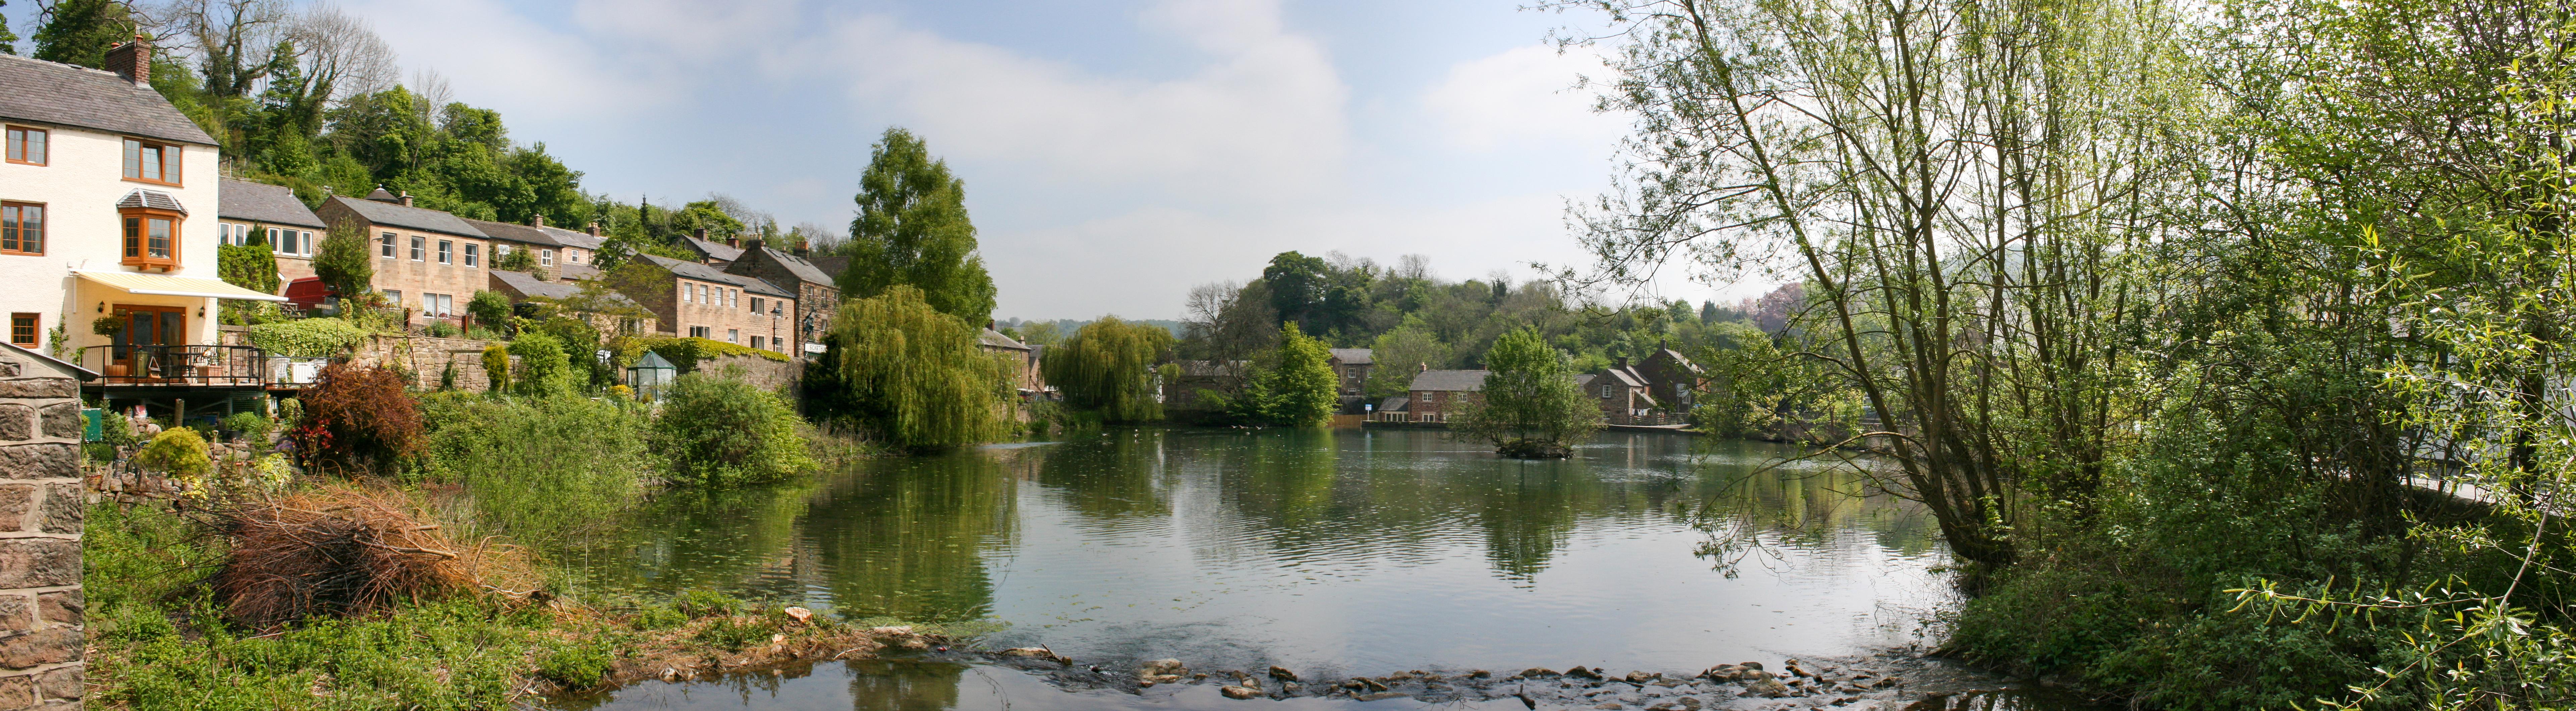 File Cromford Mill Pond Jpg Wikimedia Commons